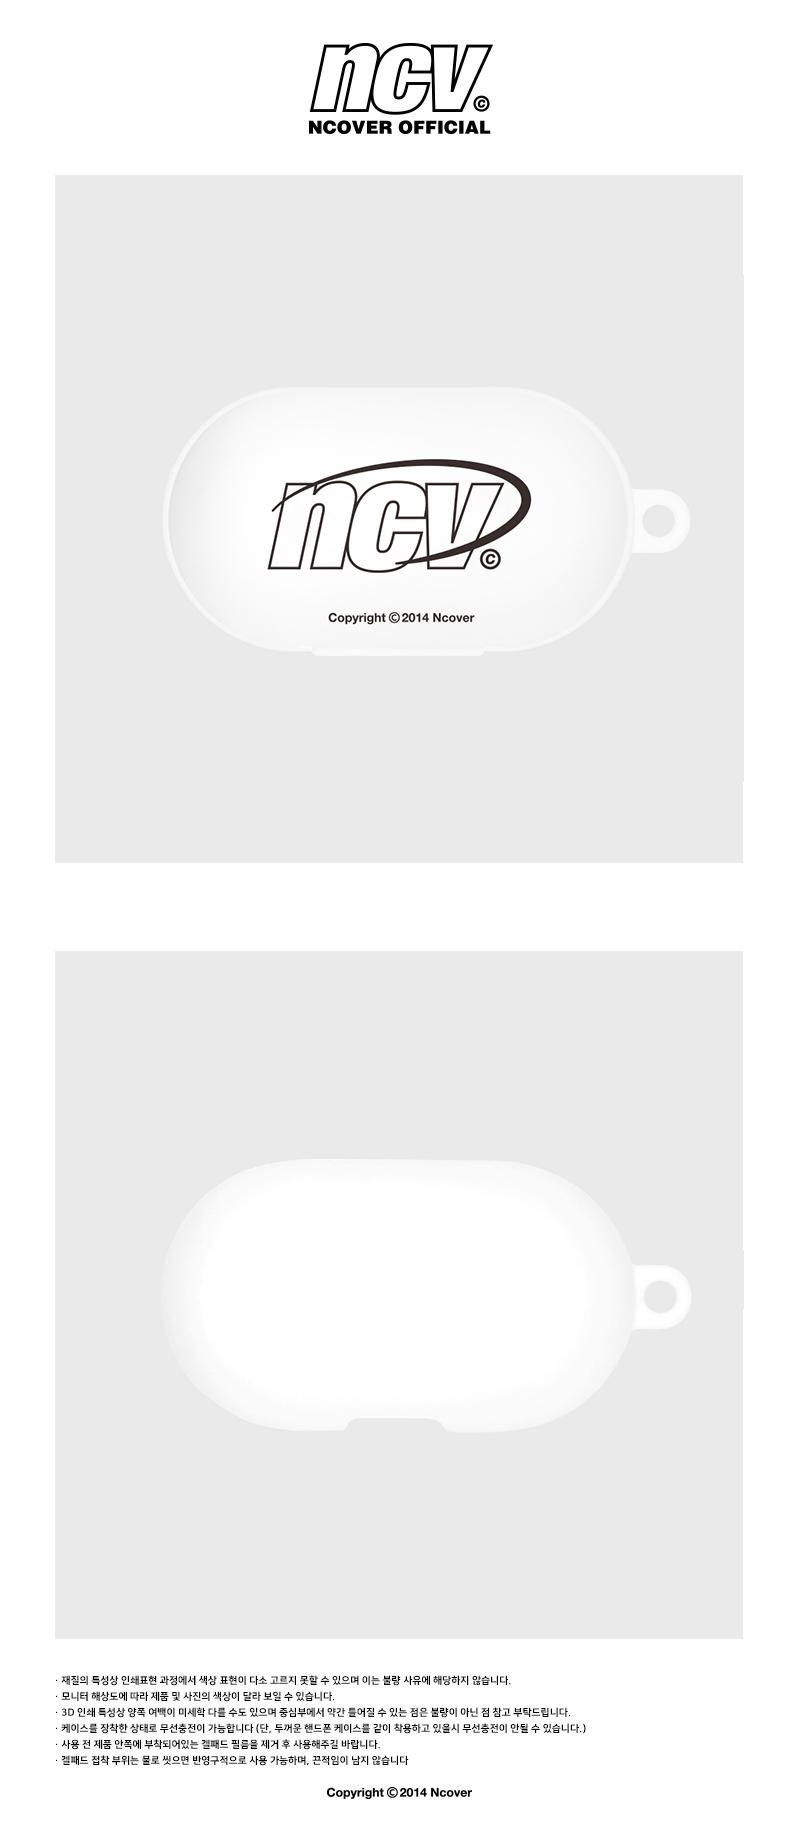 Quarter ellipse logo case-white(buds jelly case).jpg